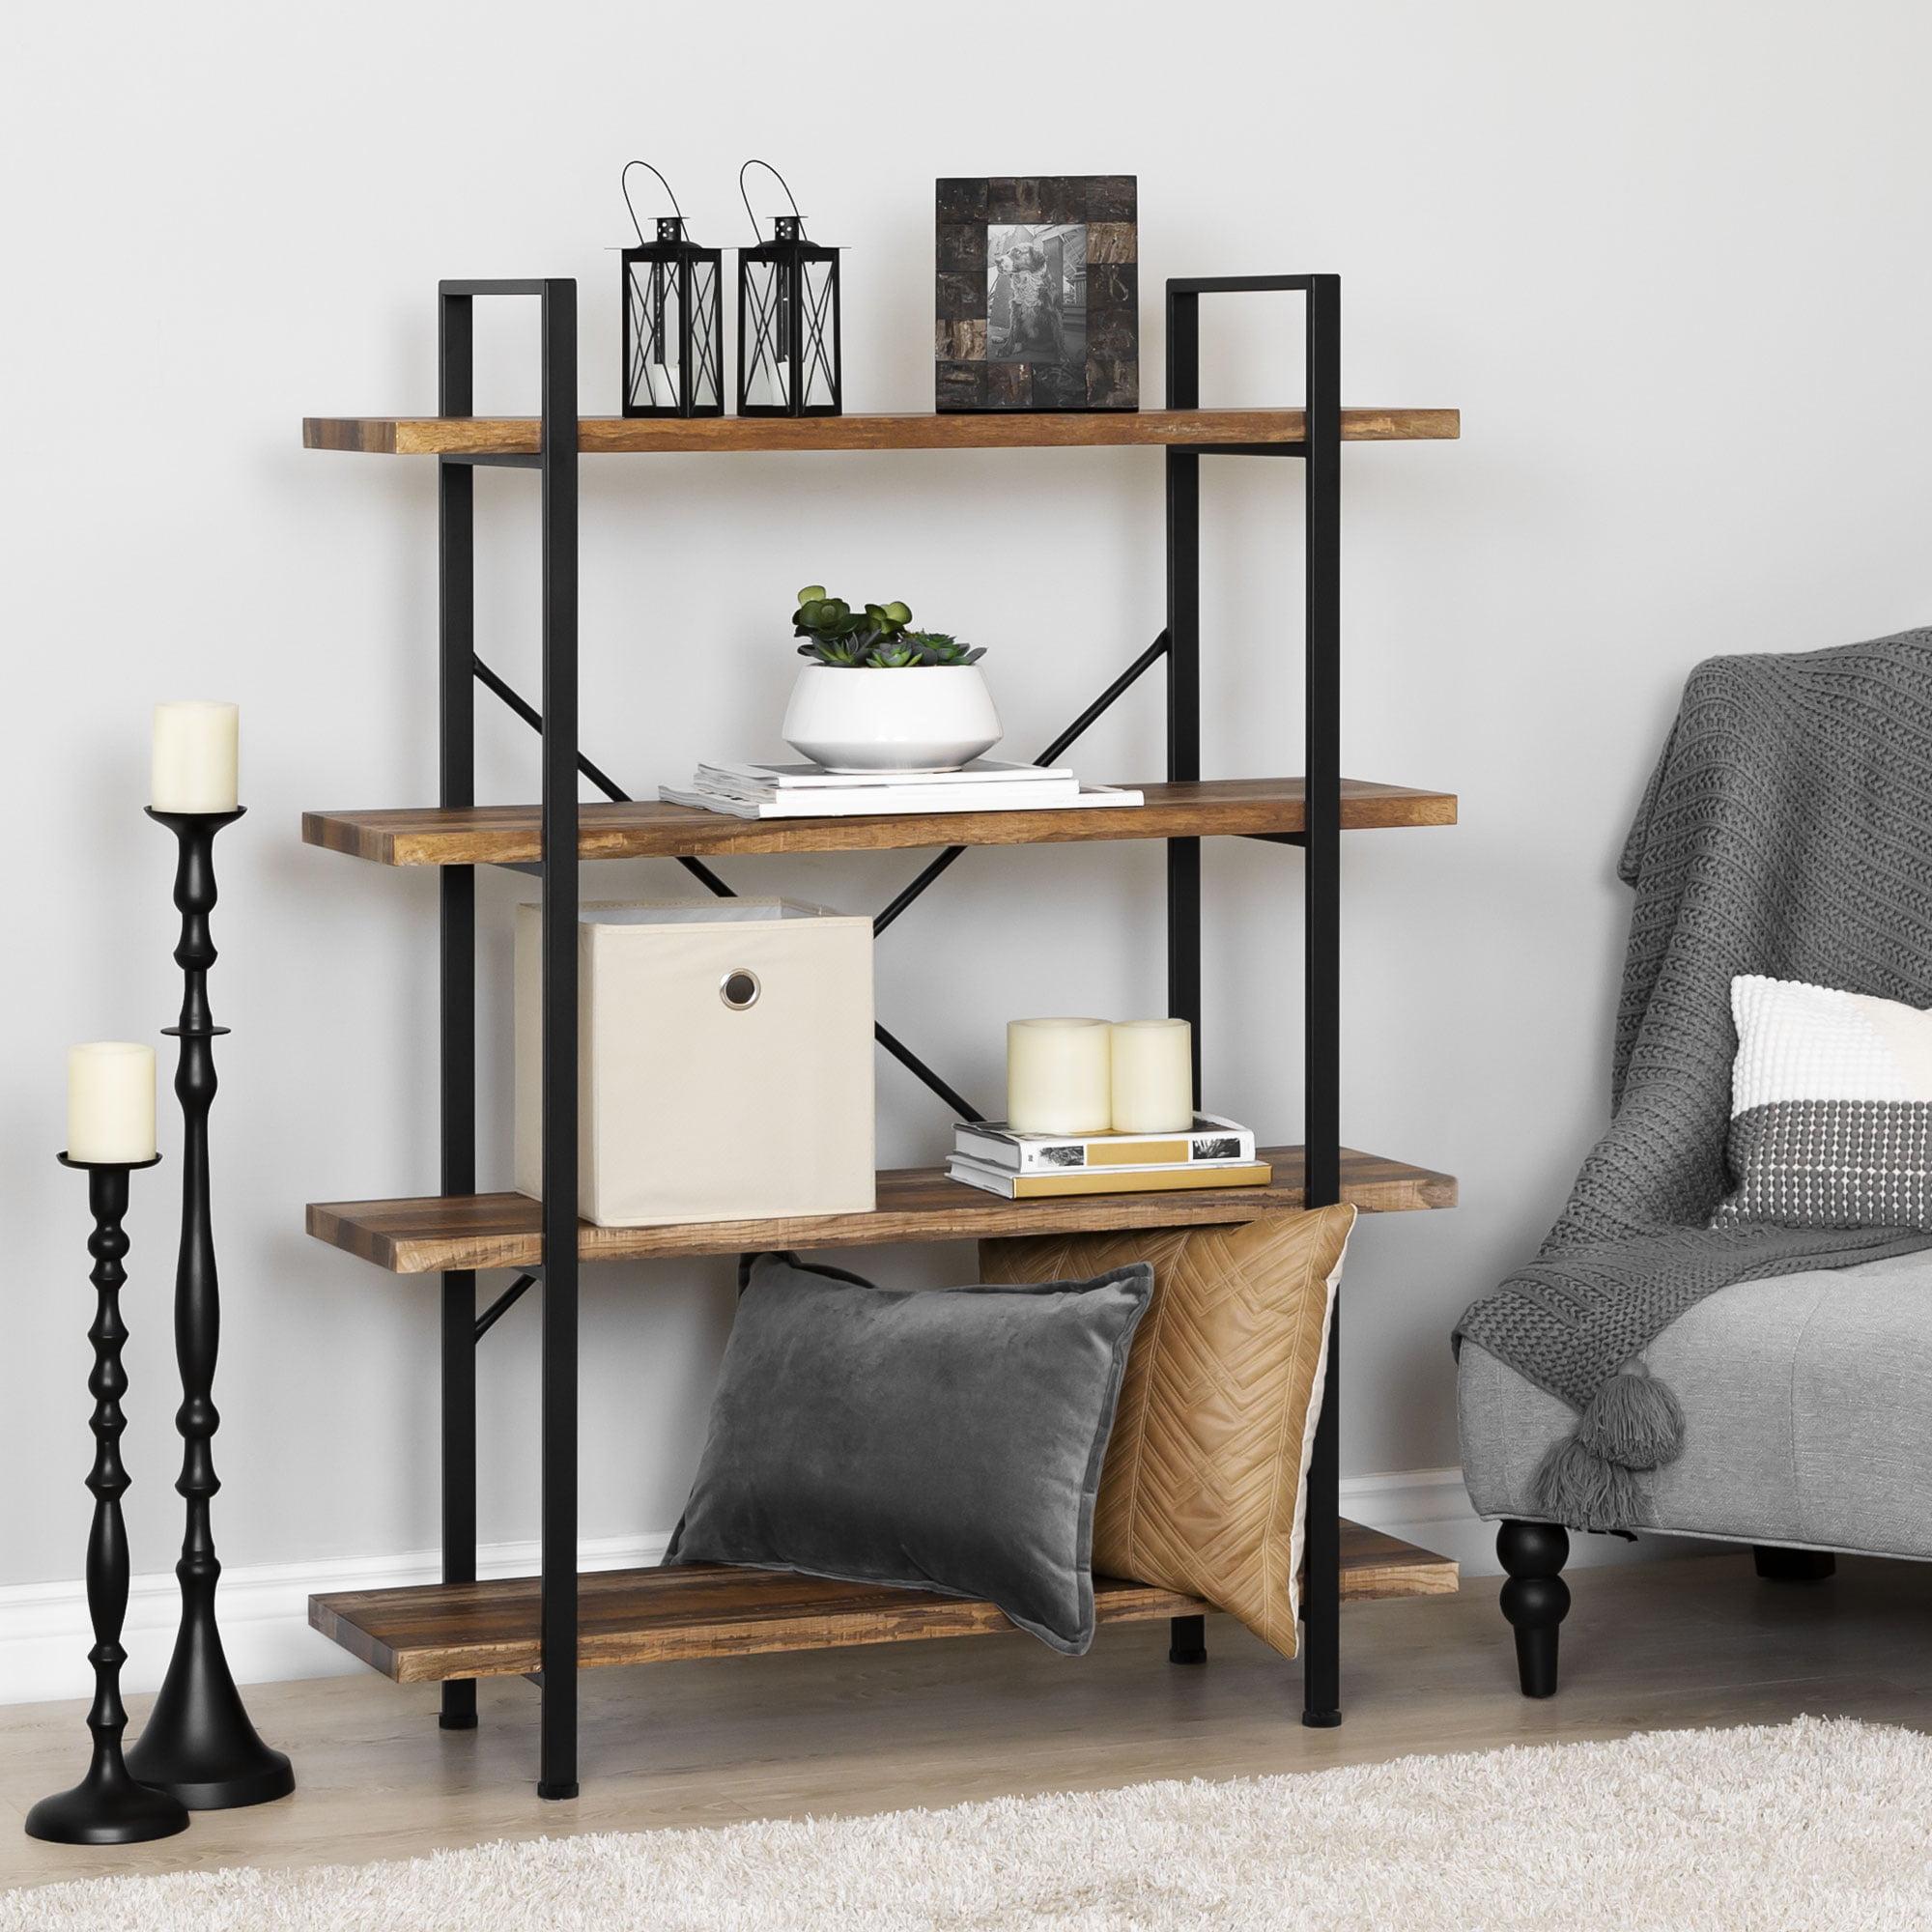 Best Choice Products 4-Shelf Industrial Open Bookshelf Organizer Furniture  for Living Room, Office w/ Wood Shelves, Metal Frame - Brown/Black